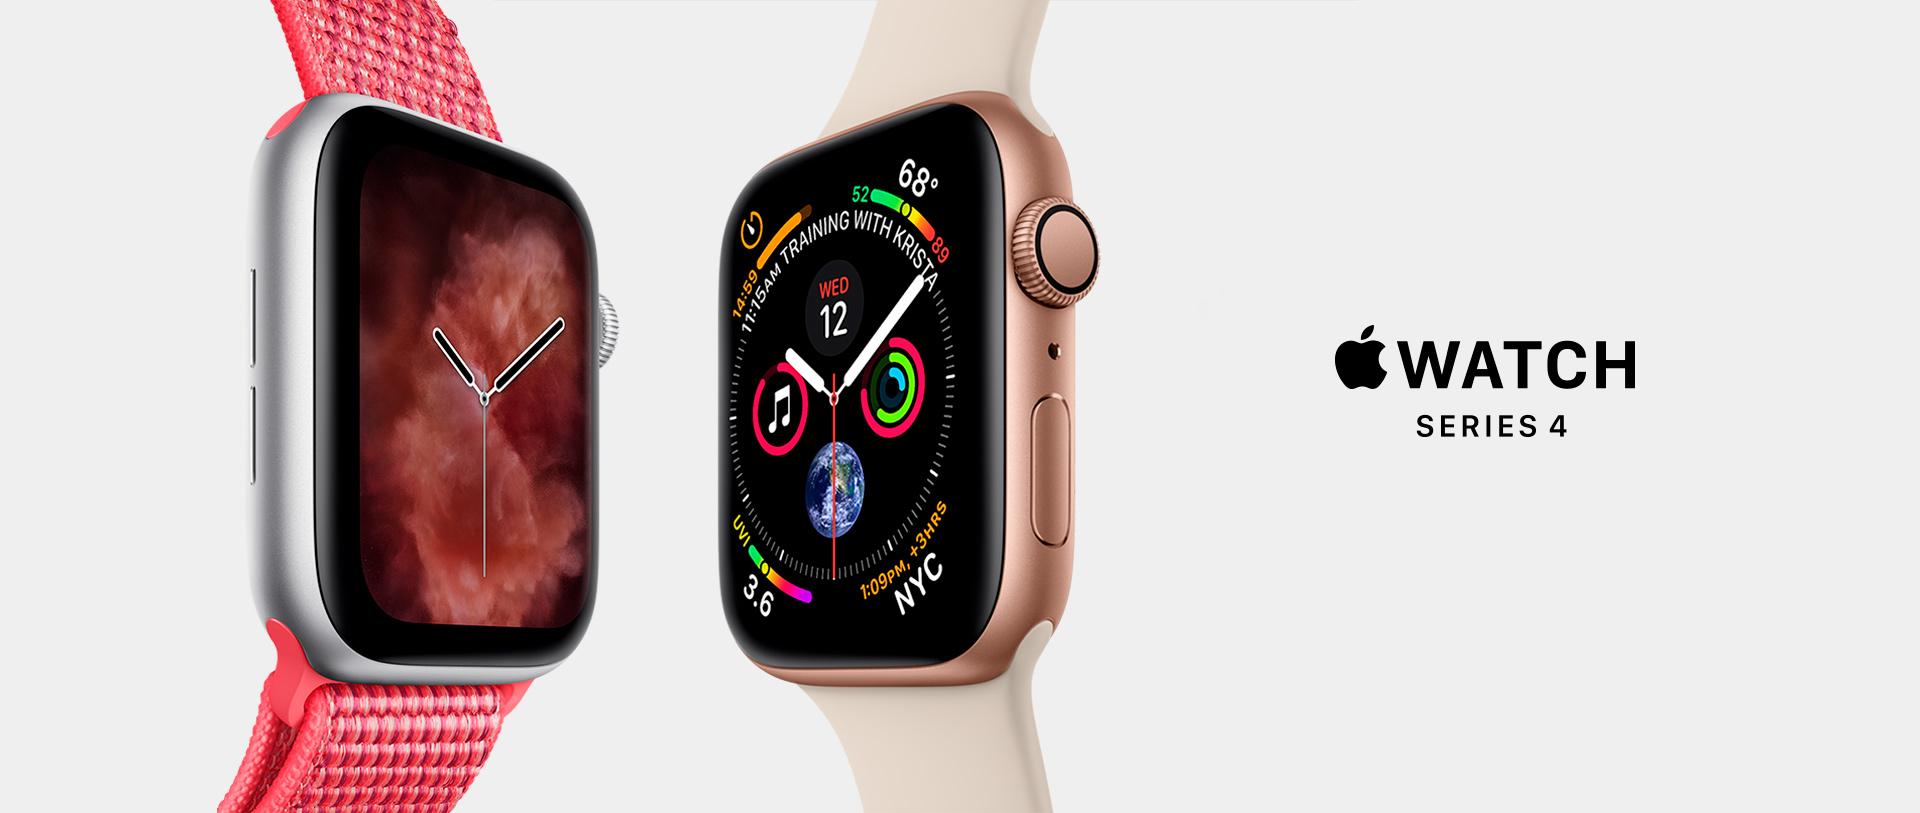 cfb210e0814 Chytré hodinky Apple Watch skladem za super cenu